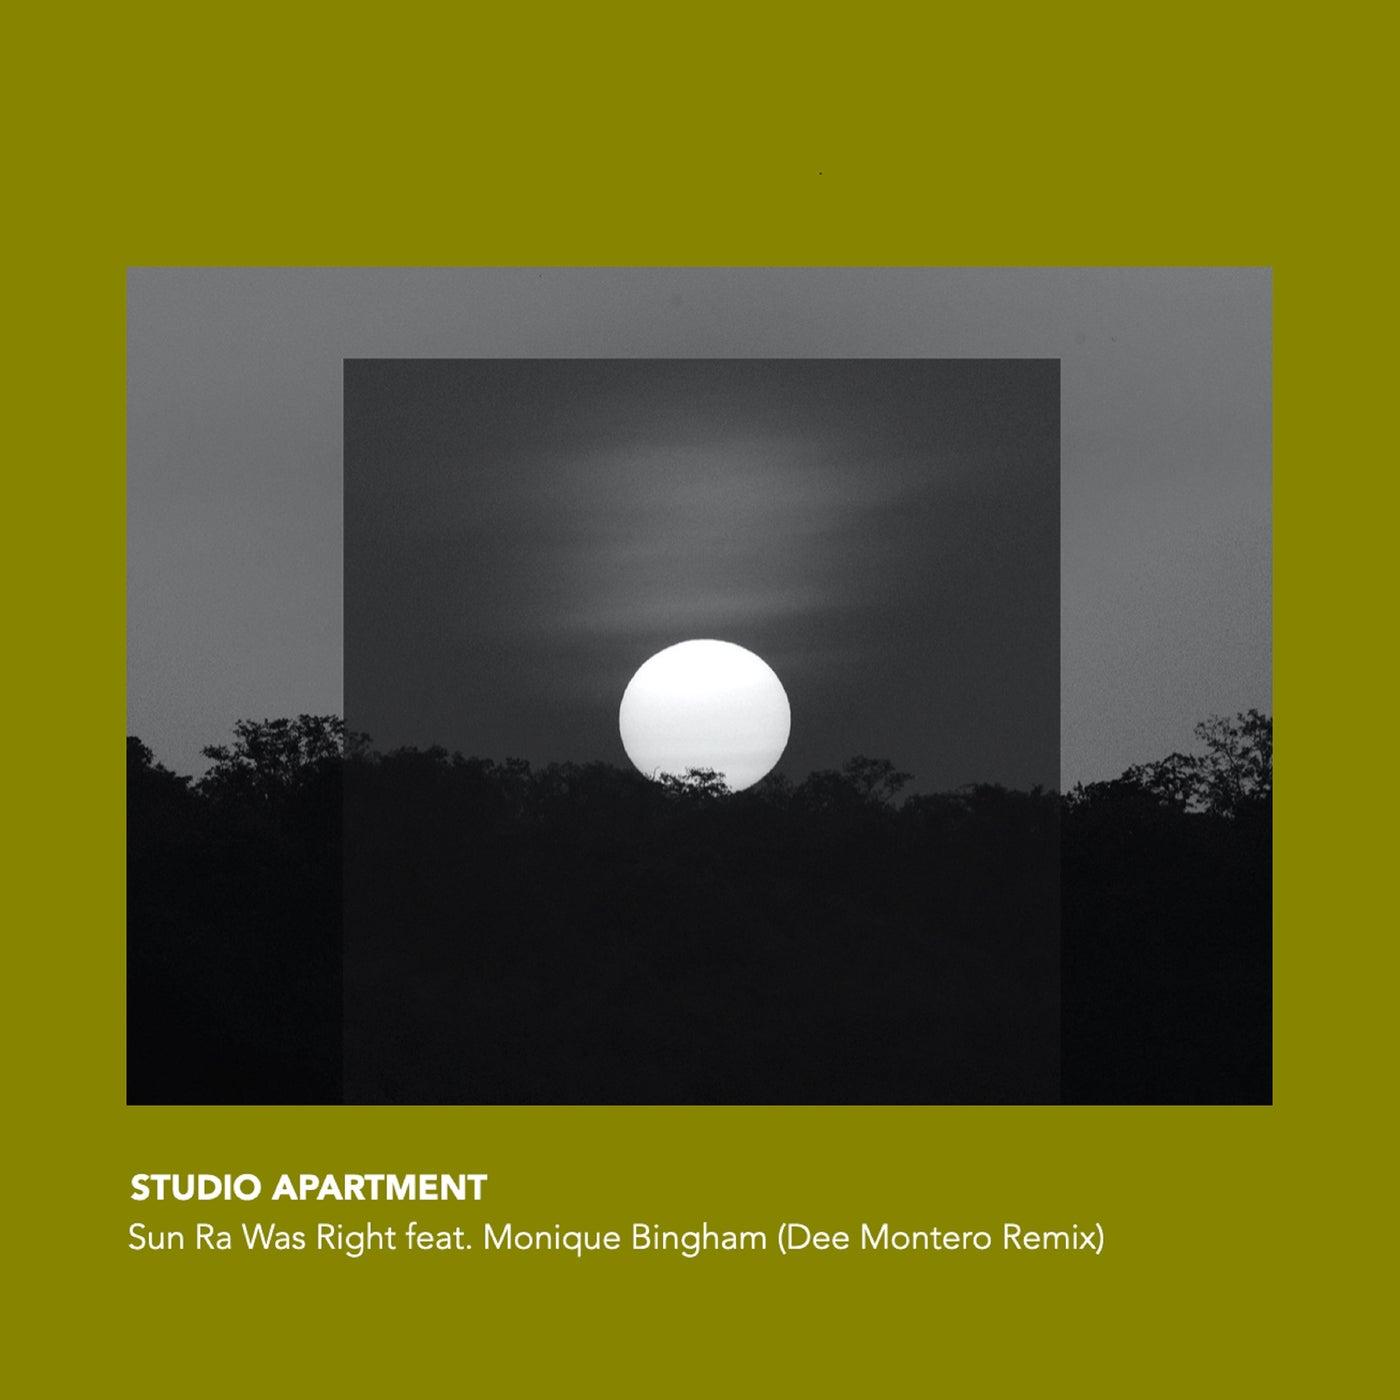 Sun Ra Was Right (Dee Montero Vocal Mix)